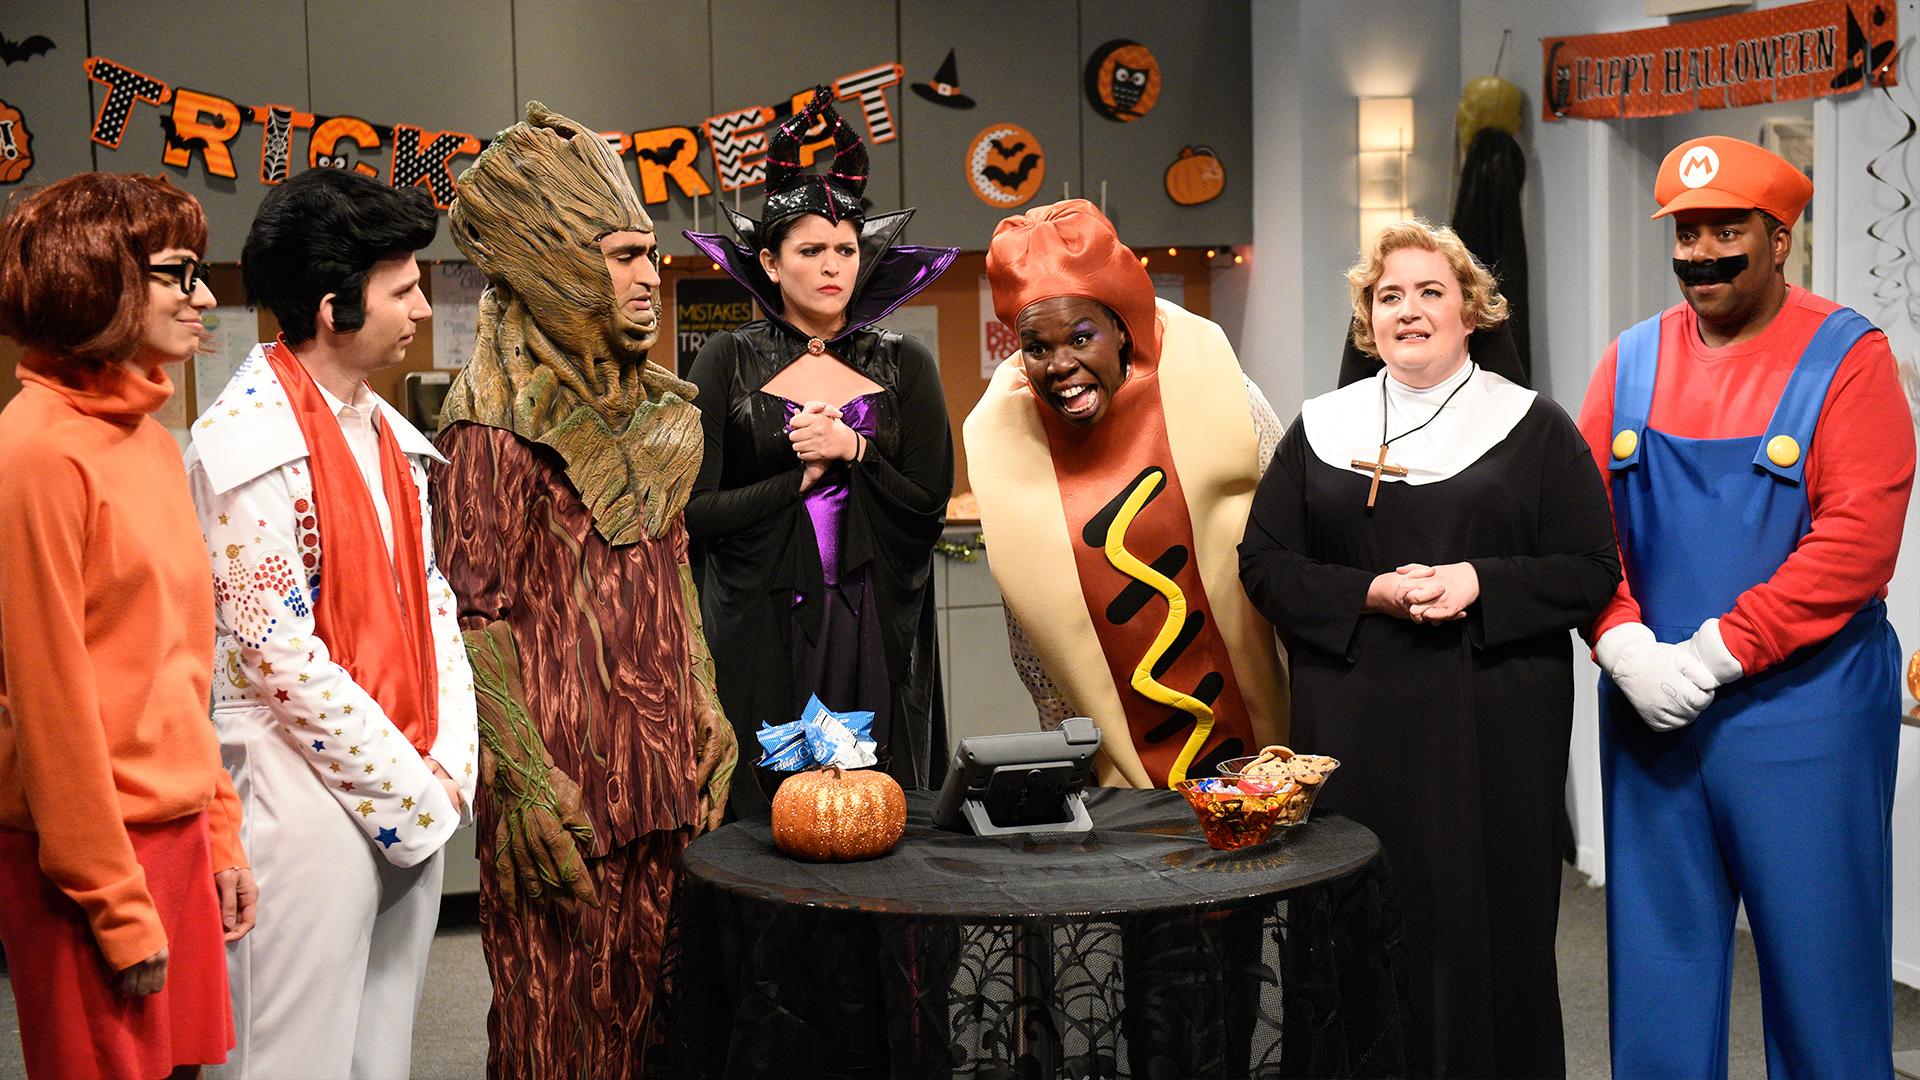 Watch Saturday Night Live Highlight: Office Halloween Party - NBC.com